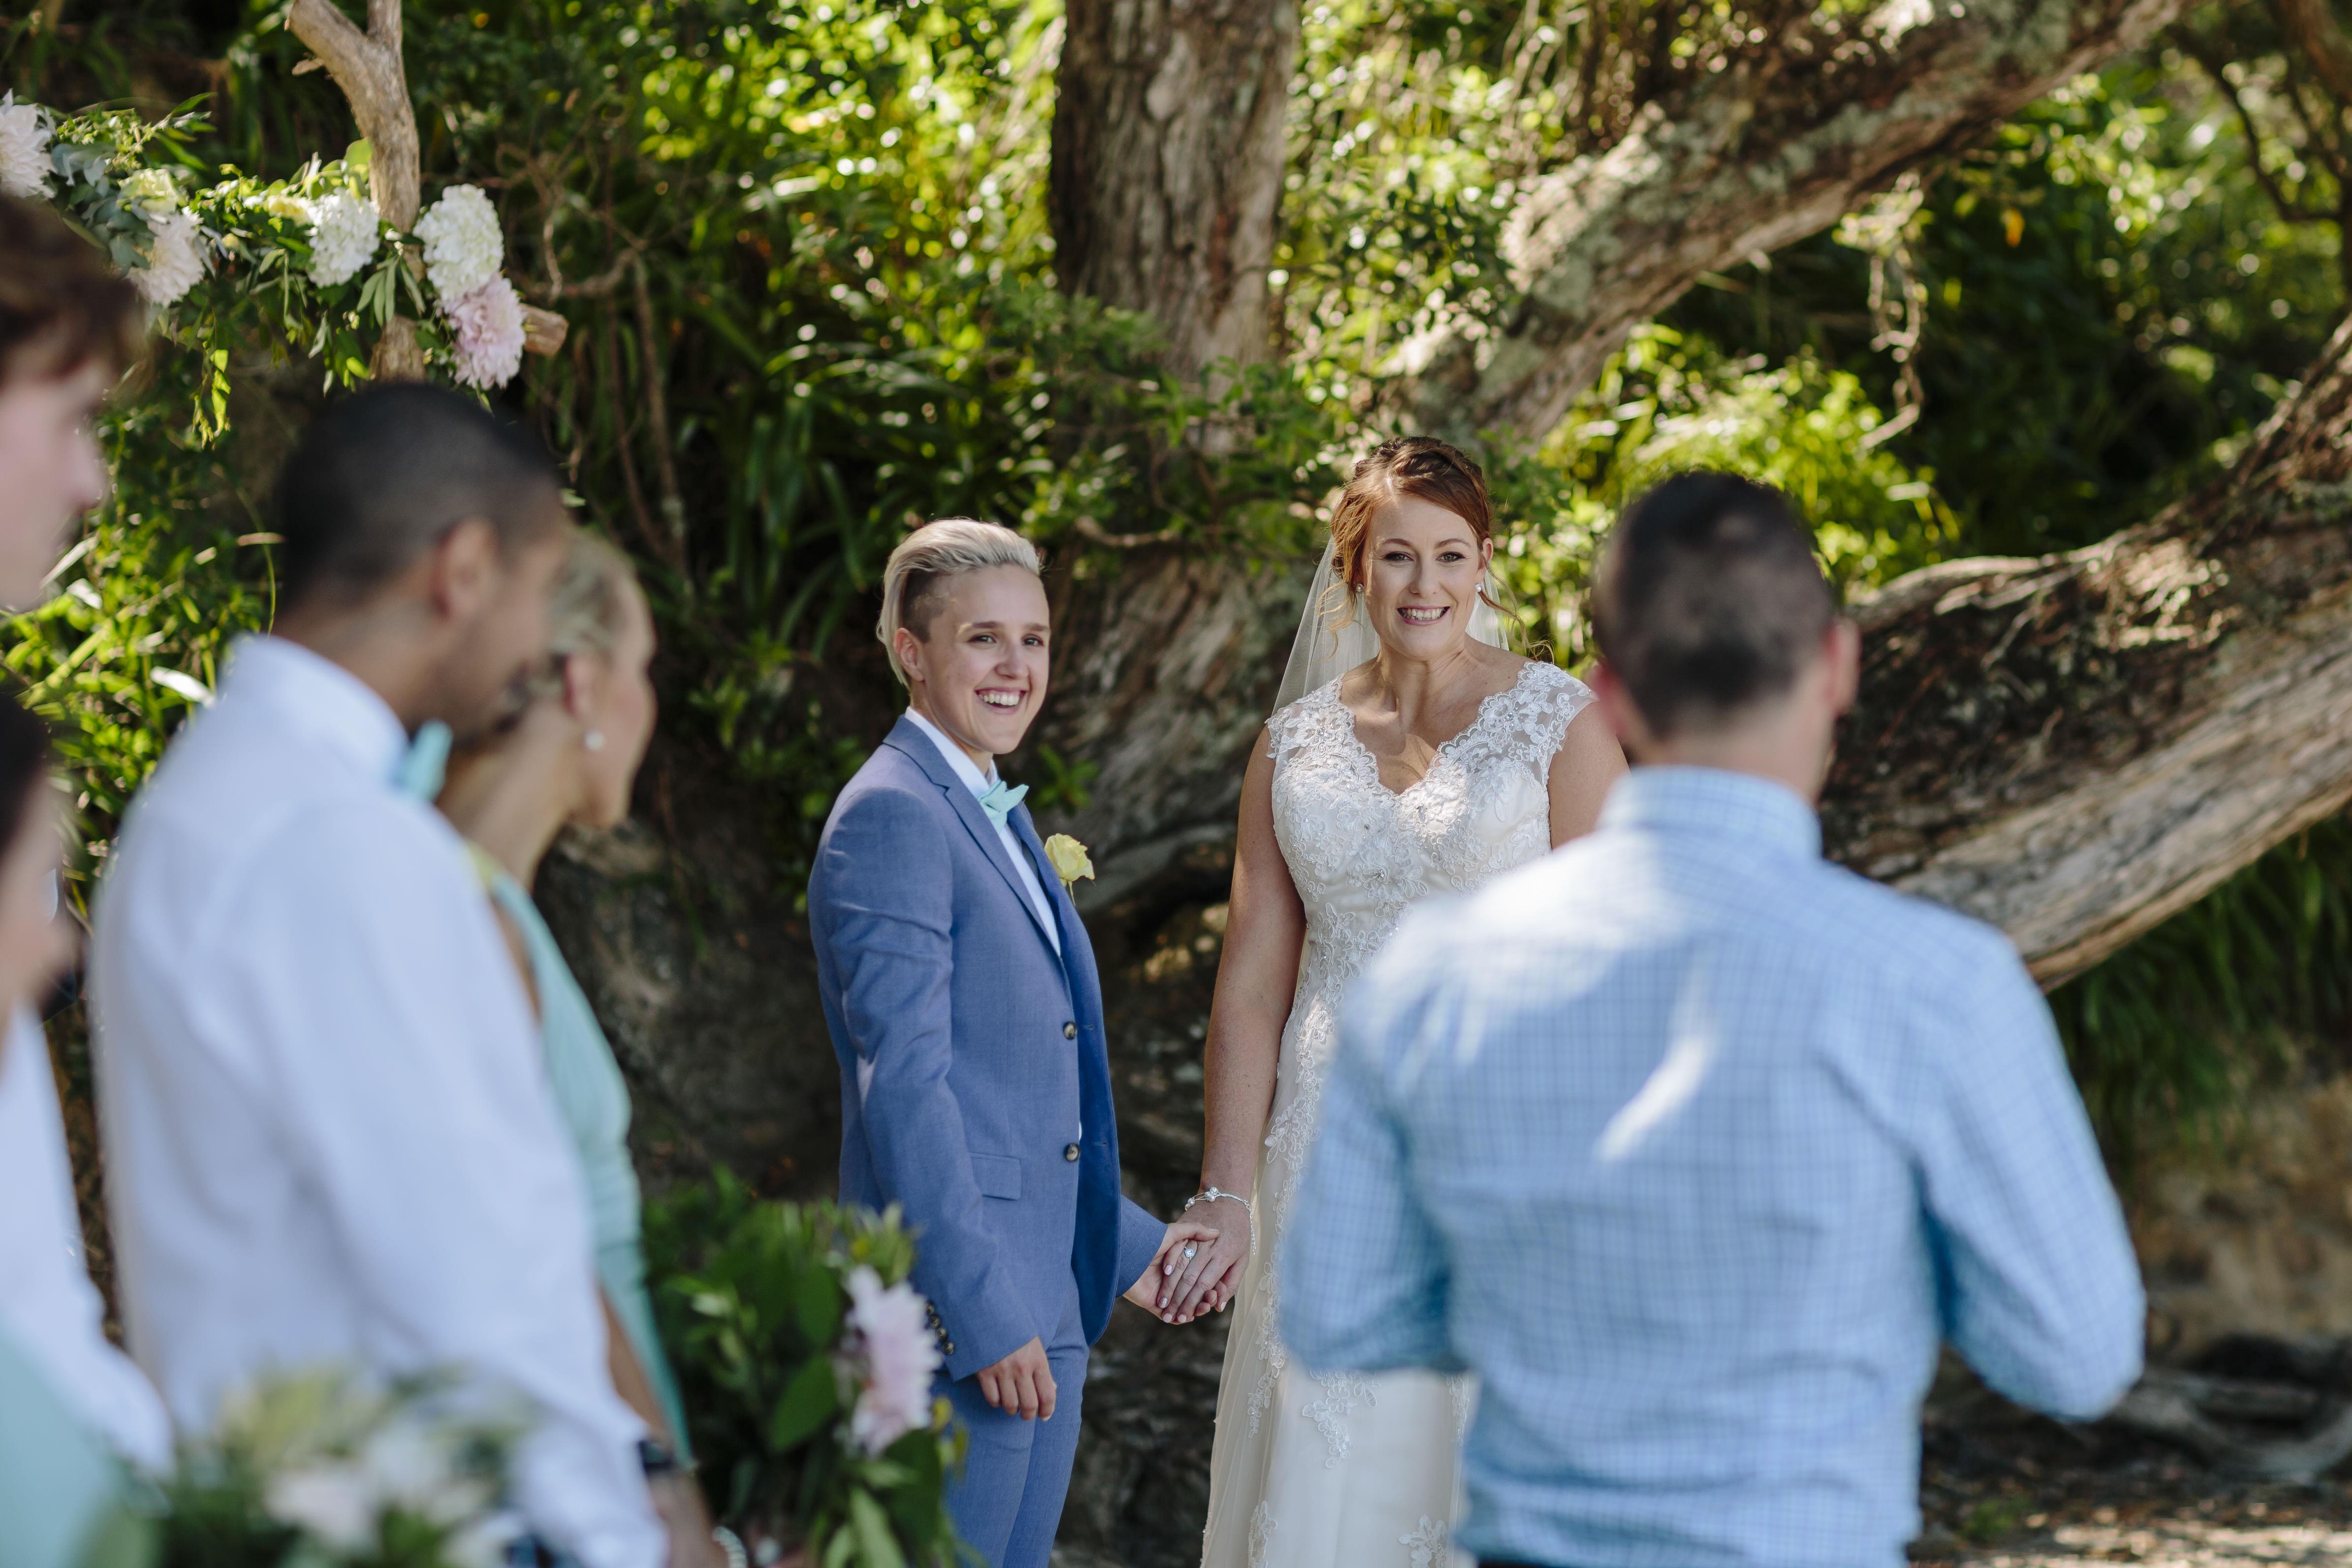 amanda-tash-the-official-photographers-wedding_top_7307